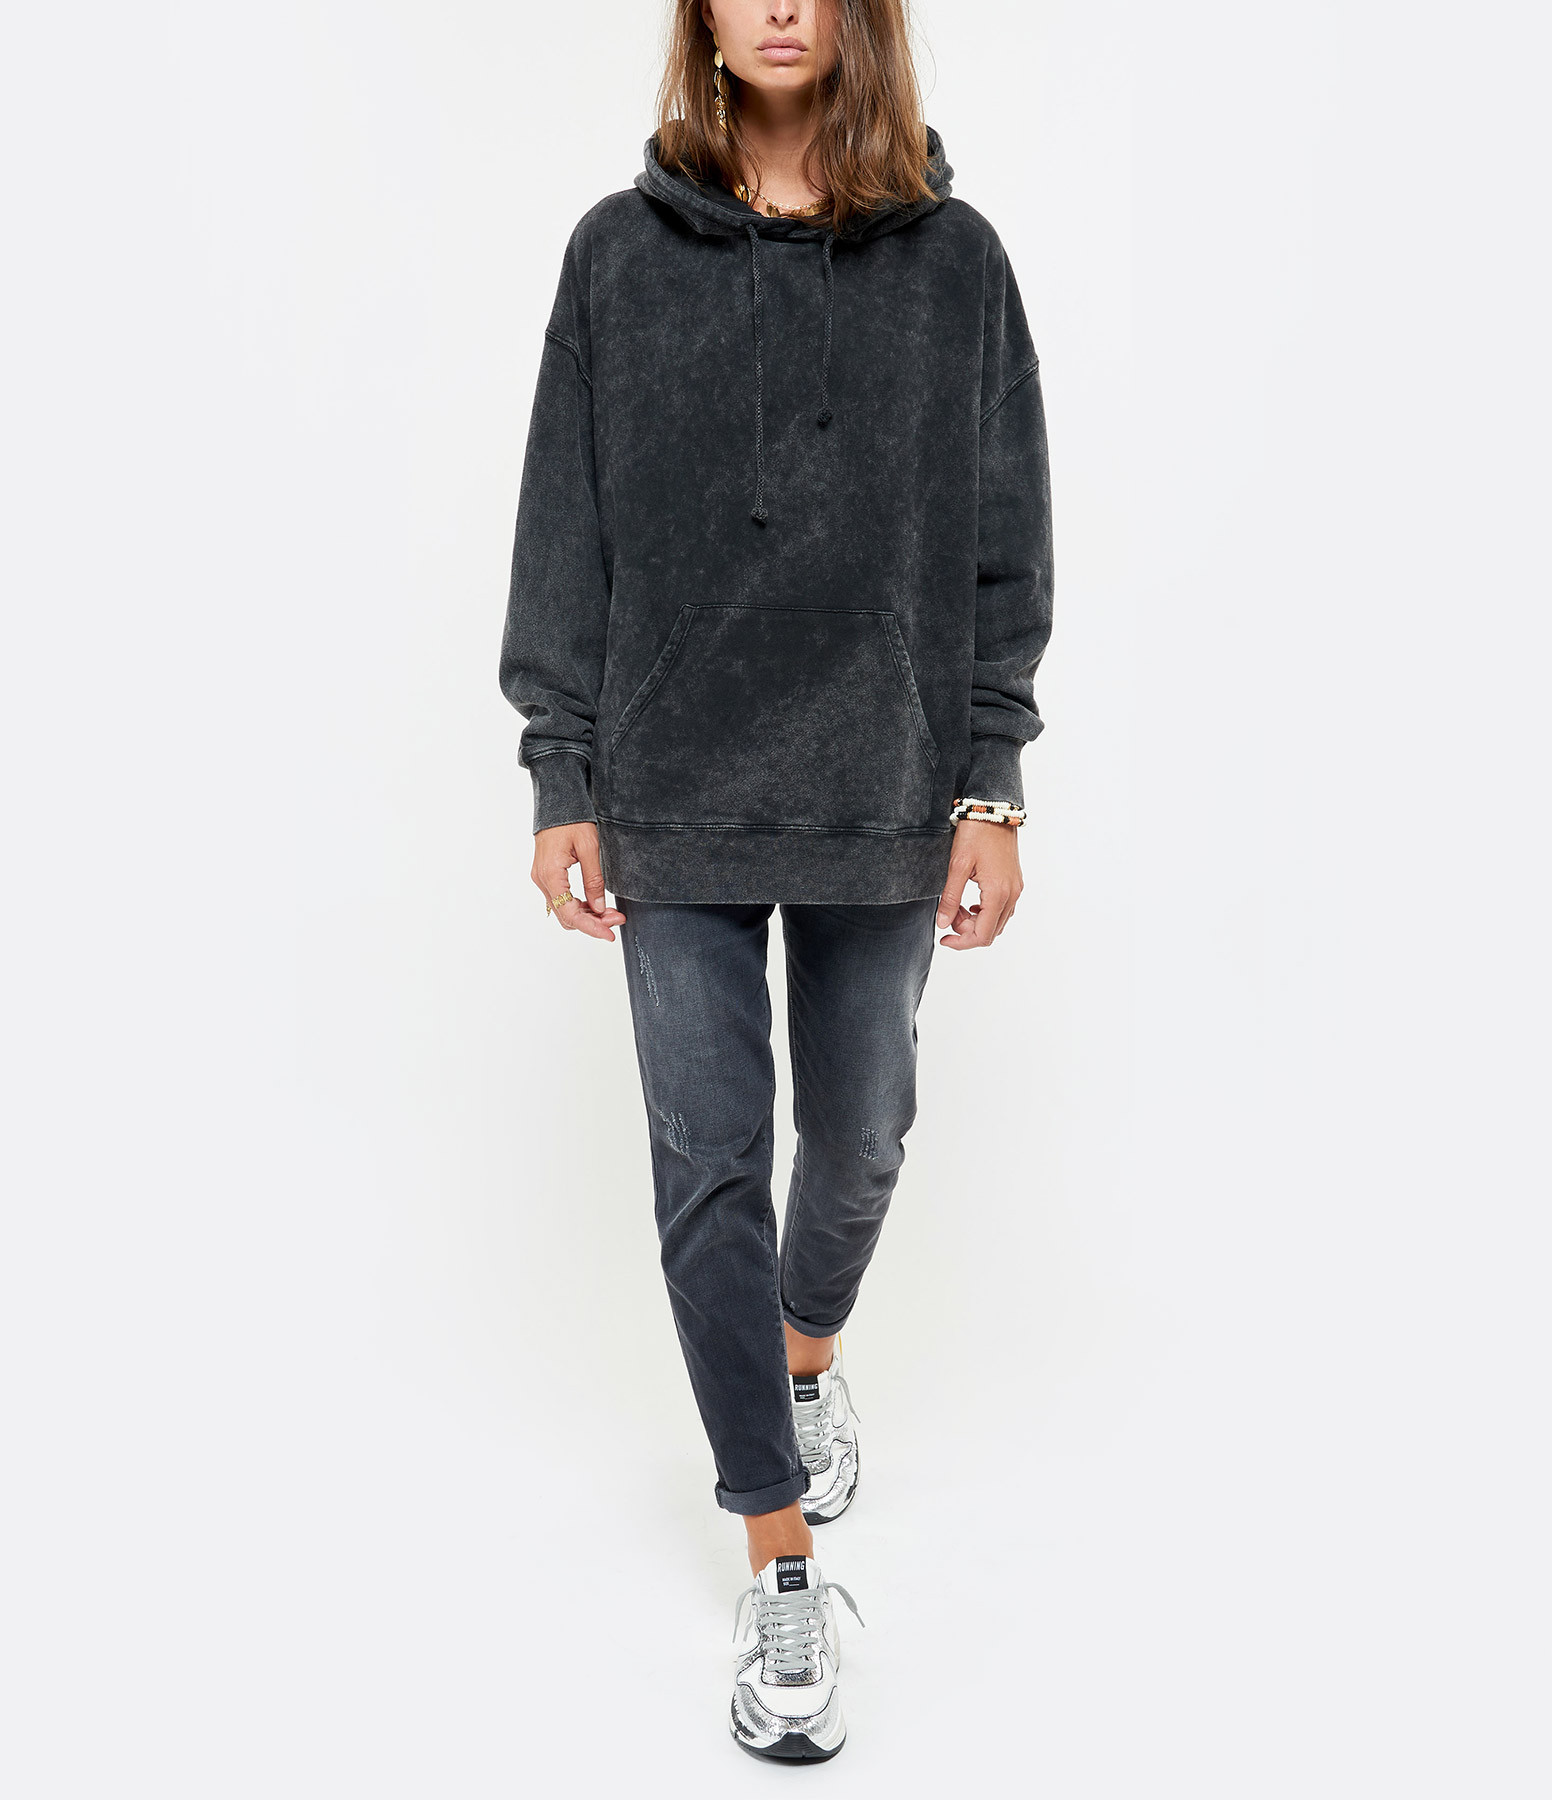 IRO - Sweatshirt Basan Coton Noir Écru